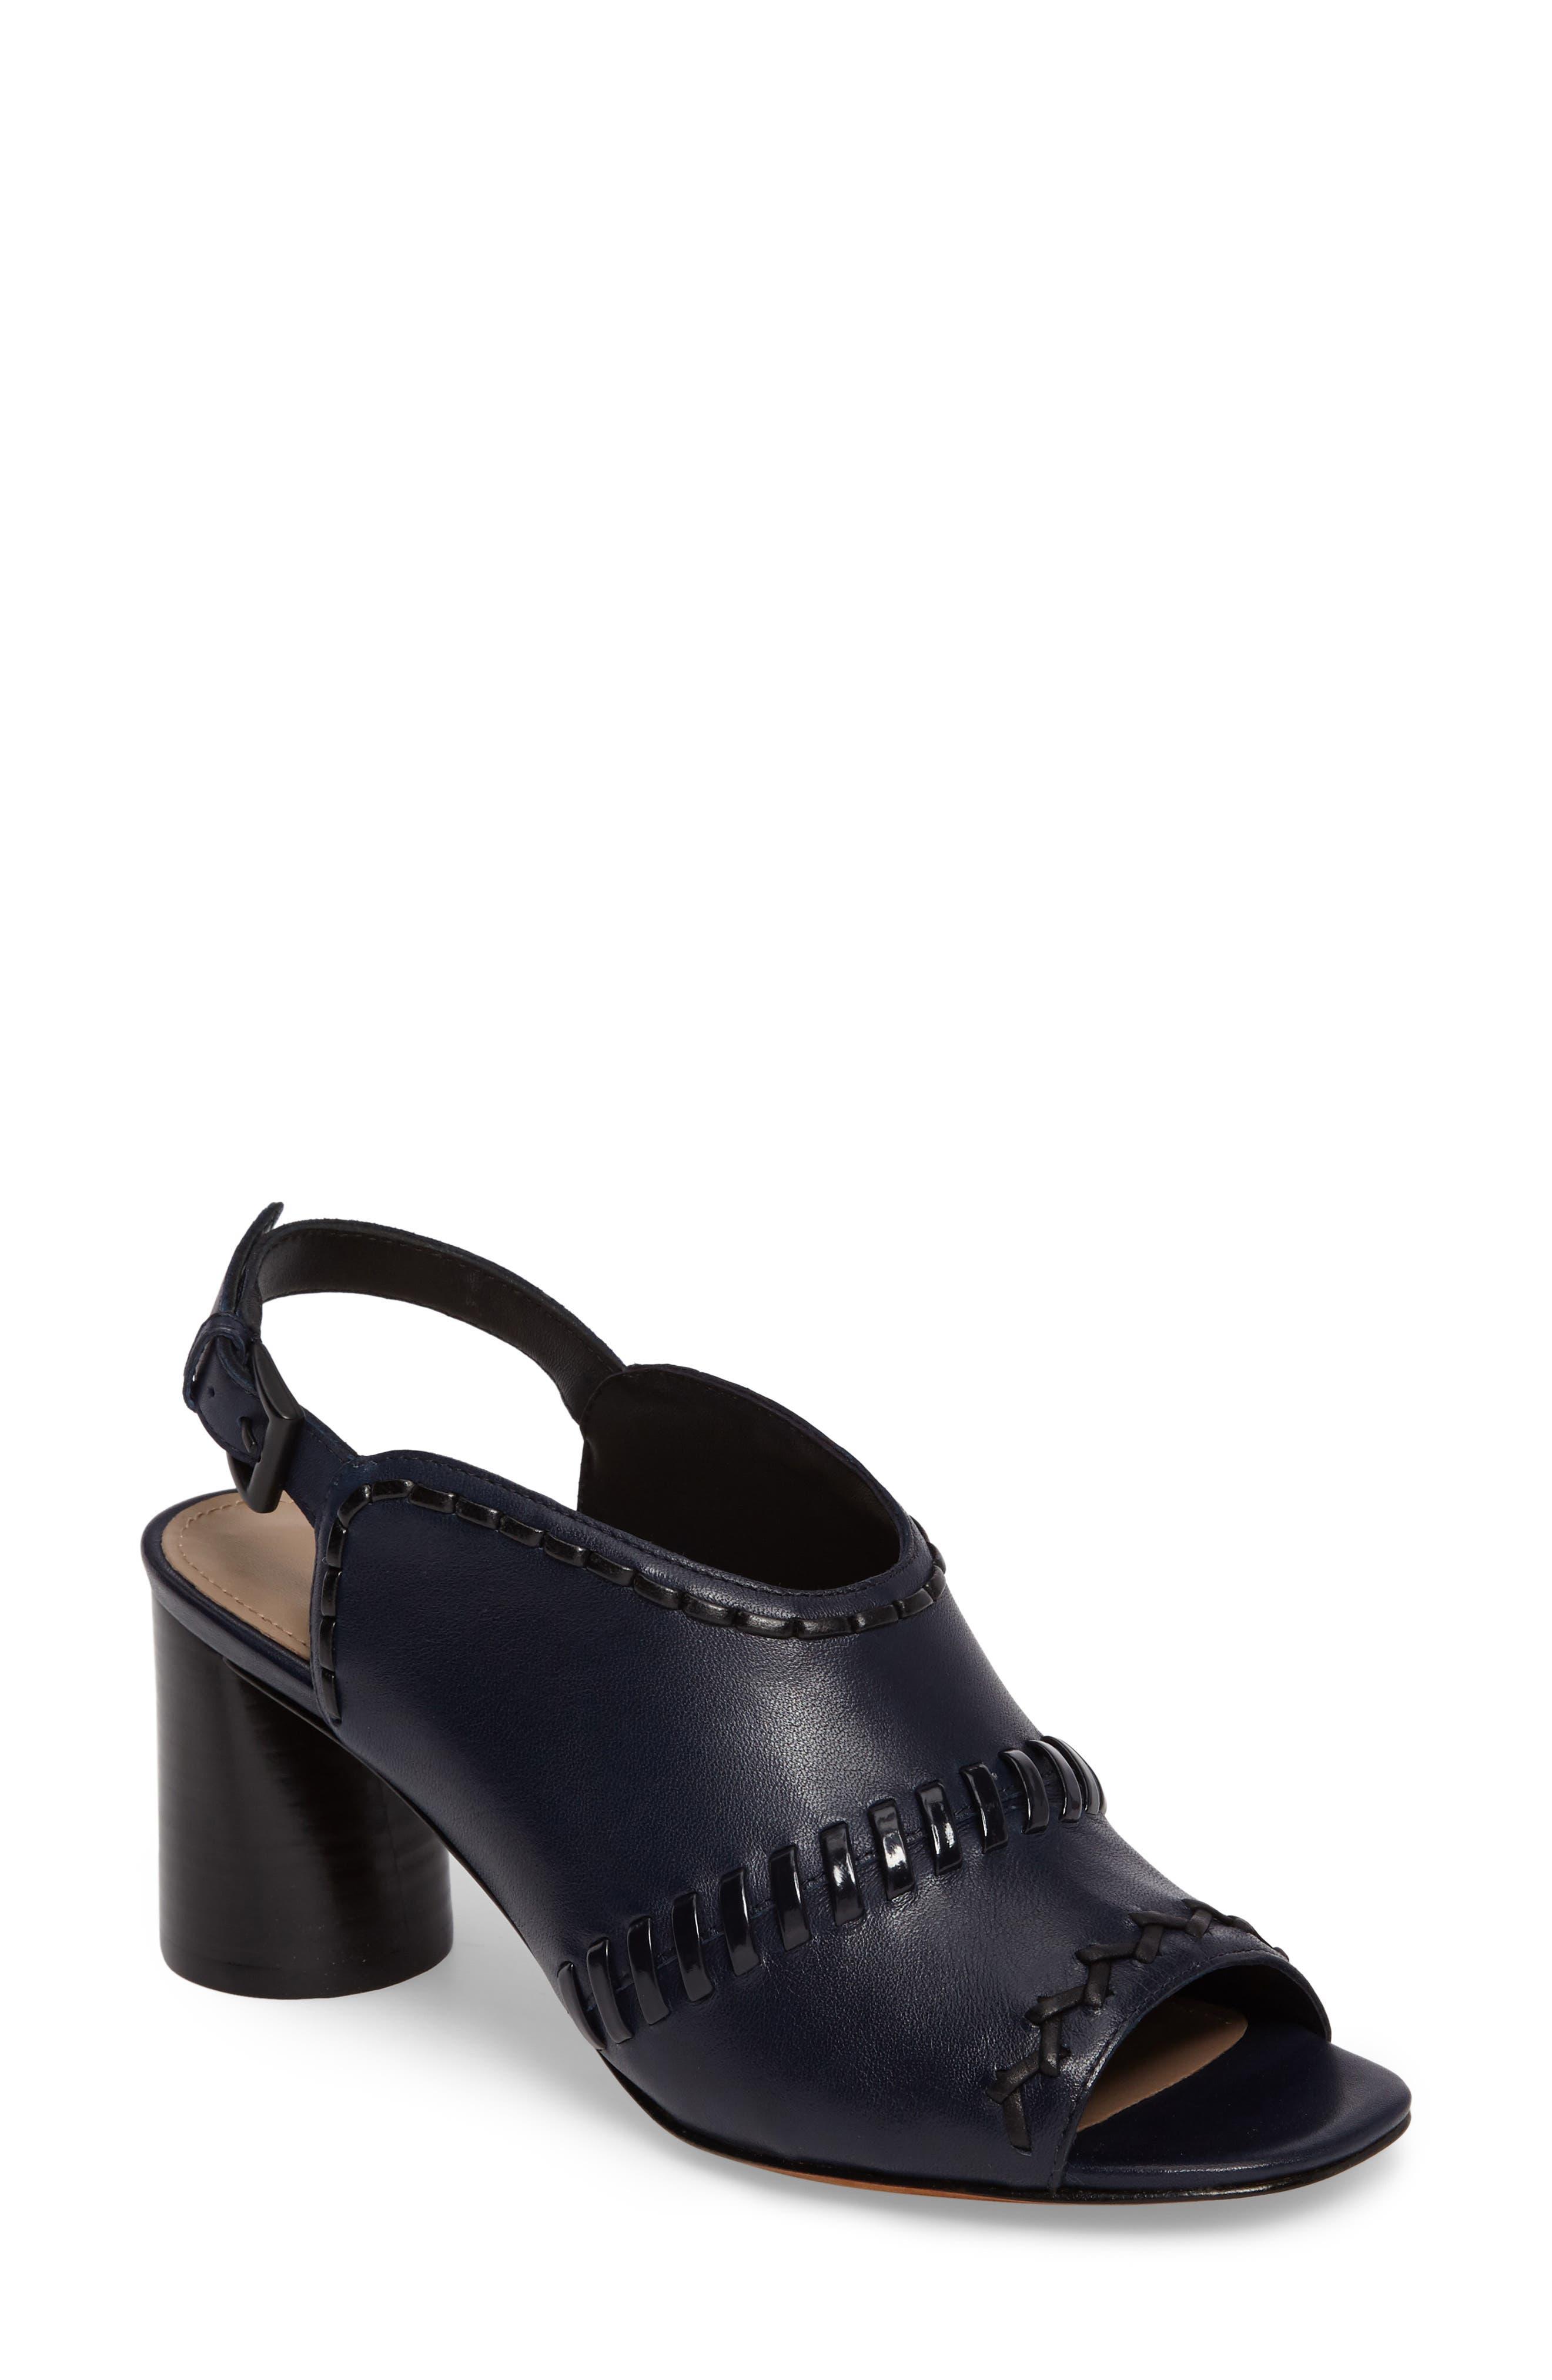 Donald J Pliner Hemi Cone Heel Slingback Sandal (Women)